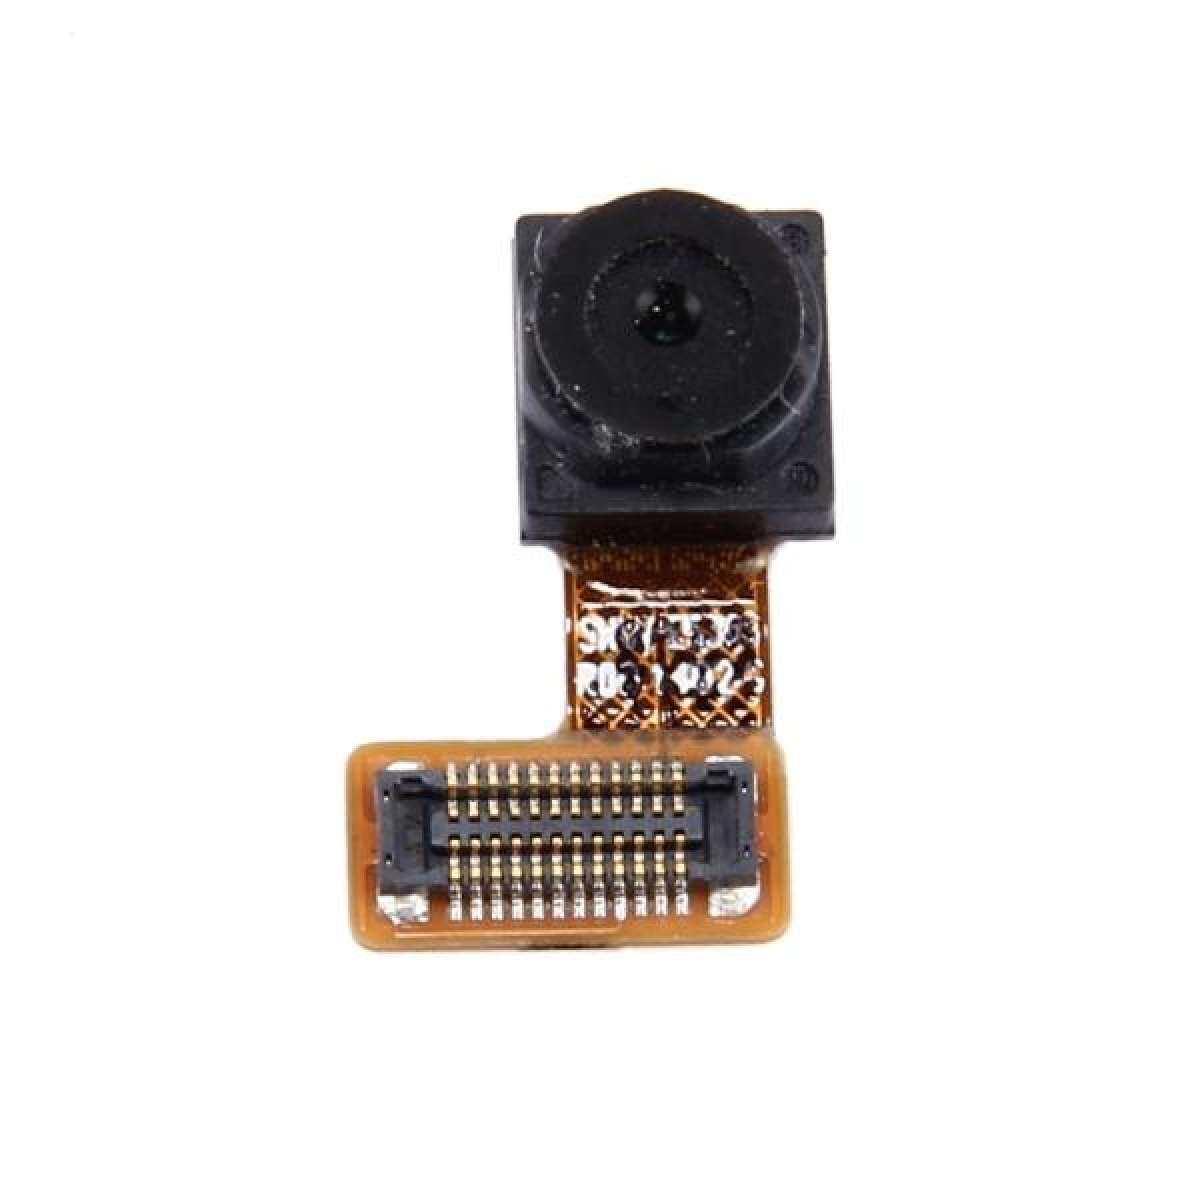 I Parts Beli Depan Penggantian Lensa Kamera untuk Samsung Galaxy S4 Aktif/I9295 (Hitam)